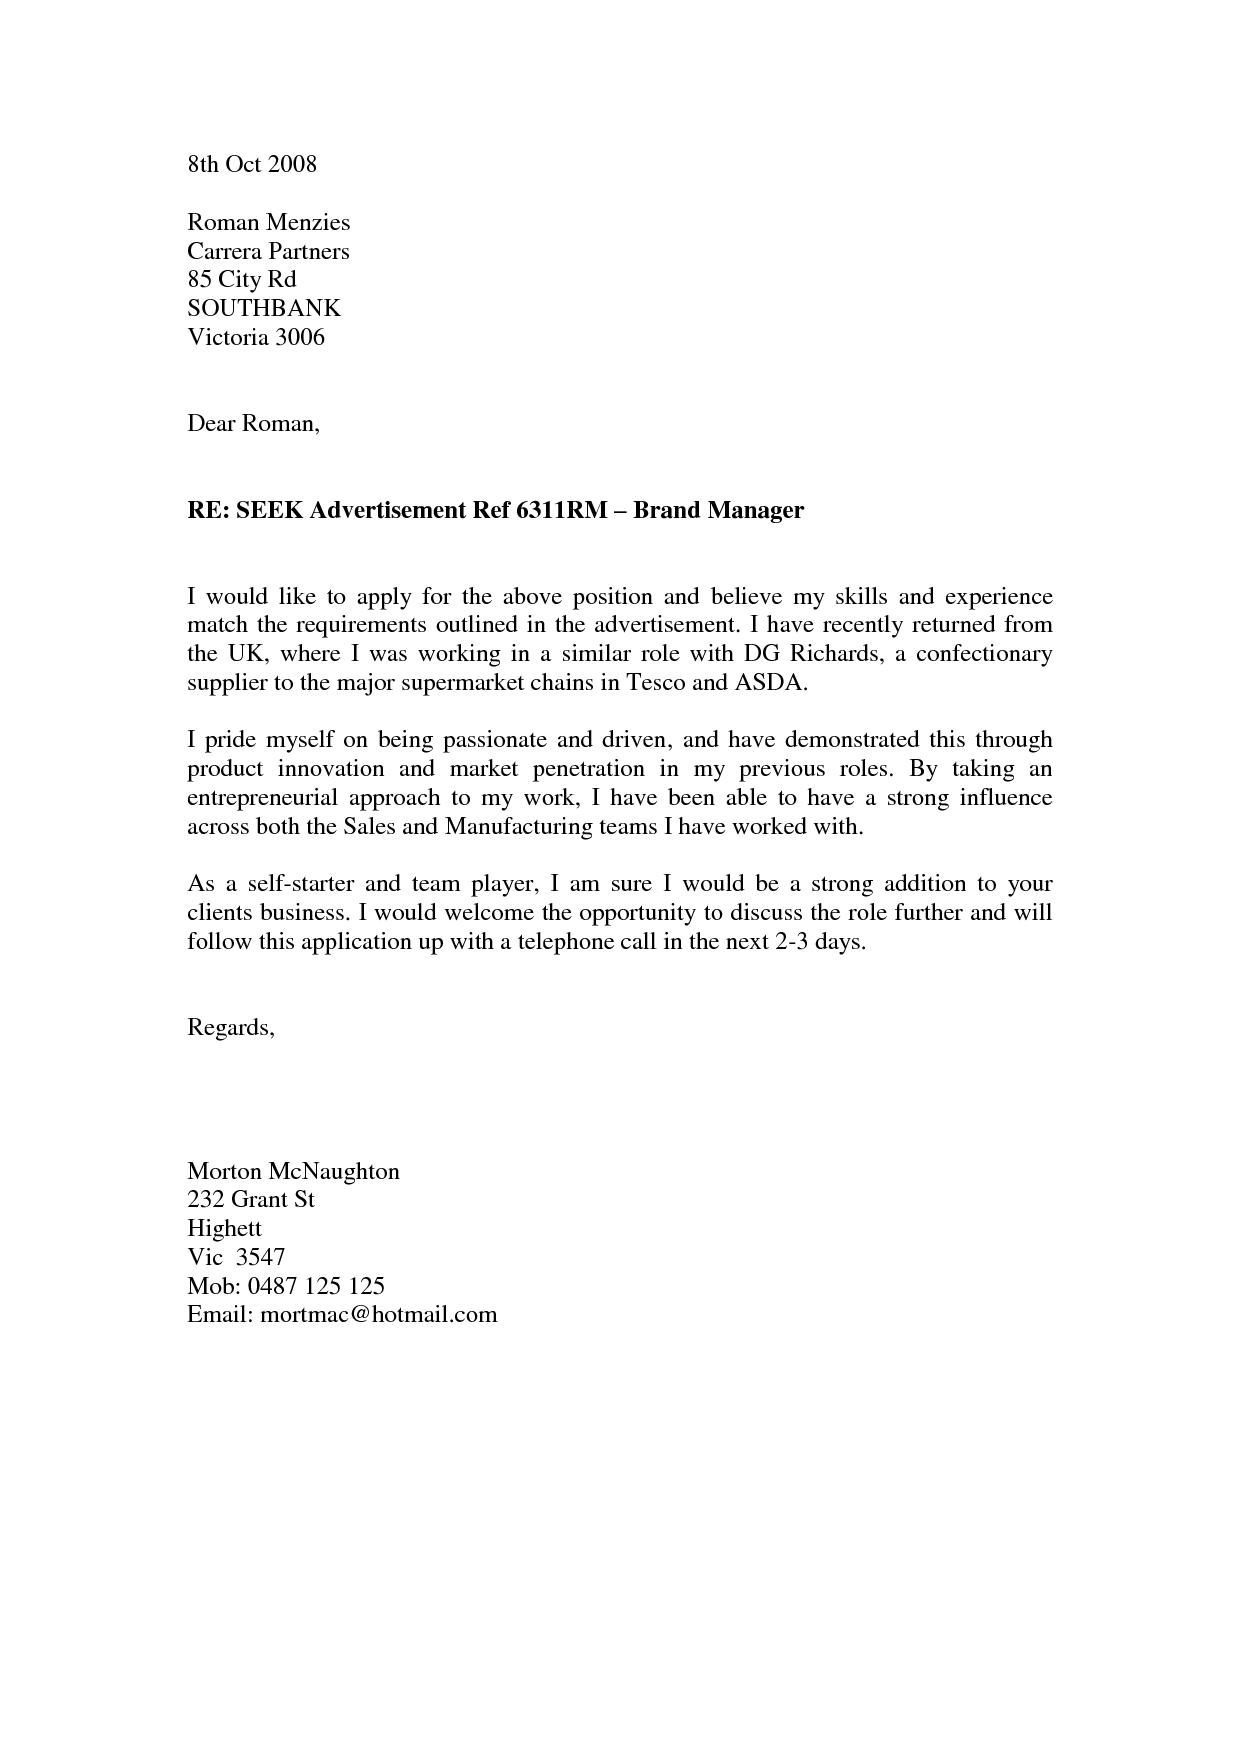 Cover Letter For Job Application As A Teacher An Effective Cover Letter For A Teacher